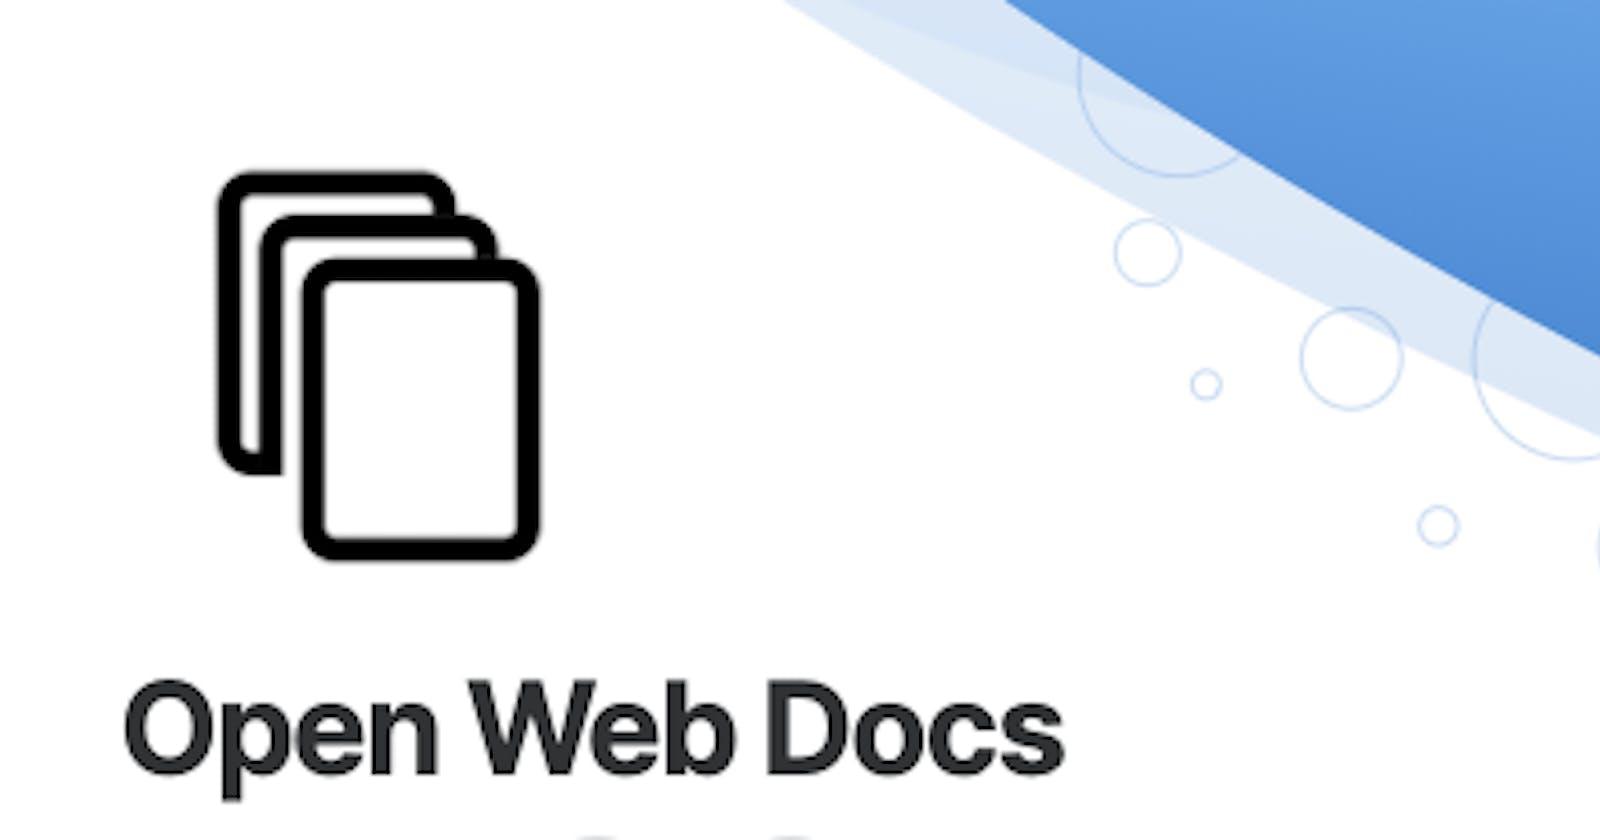 Introducing: Open Web Docs!